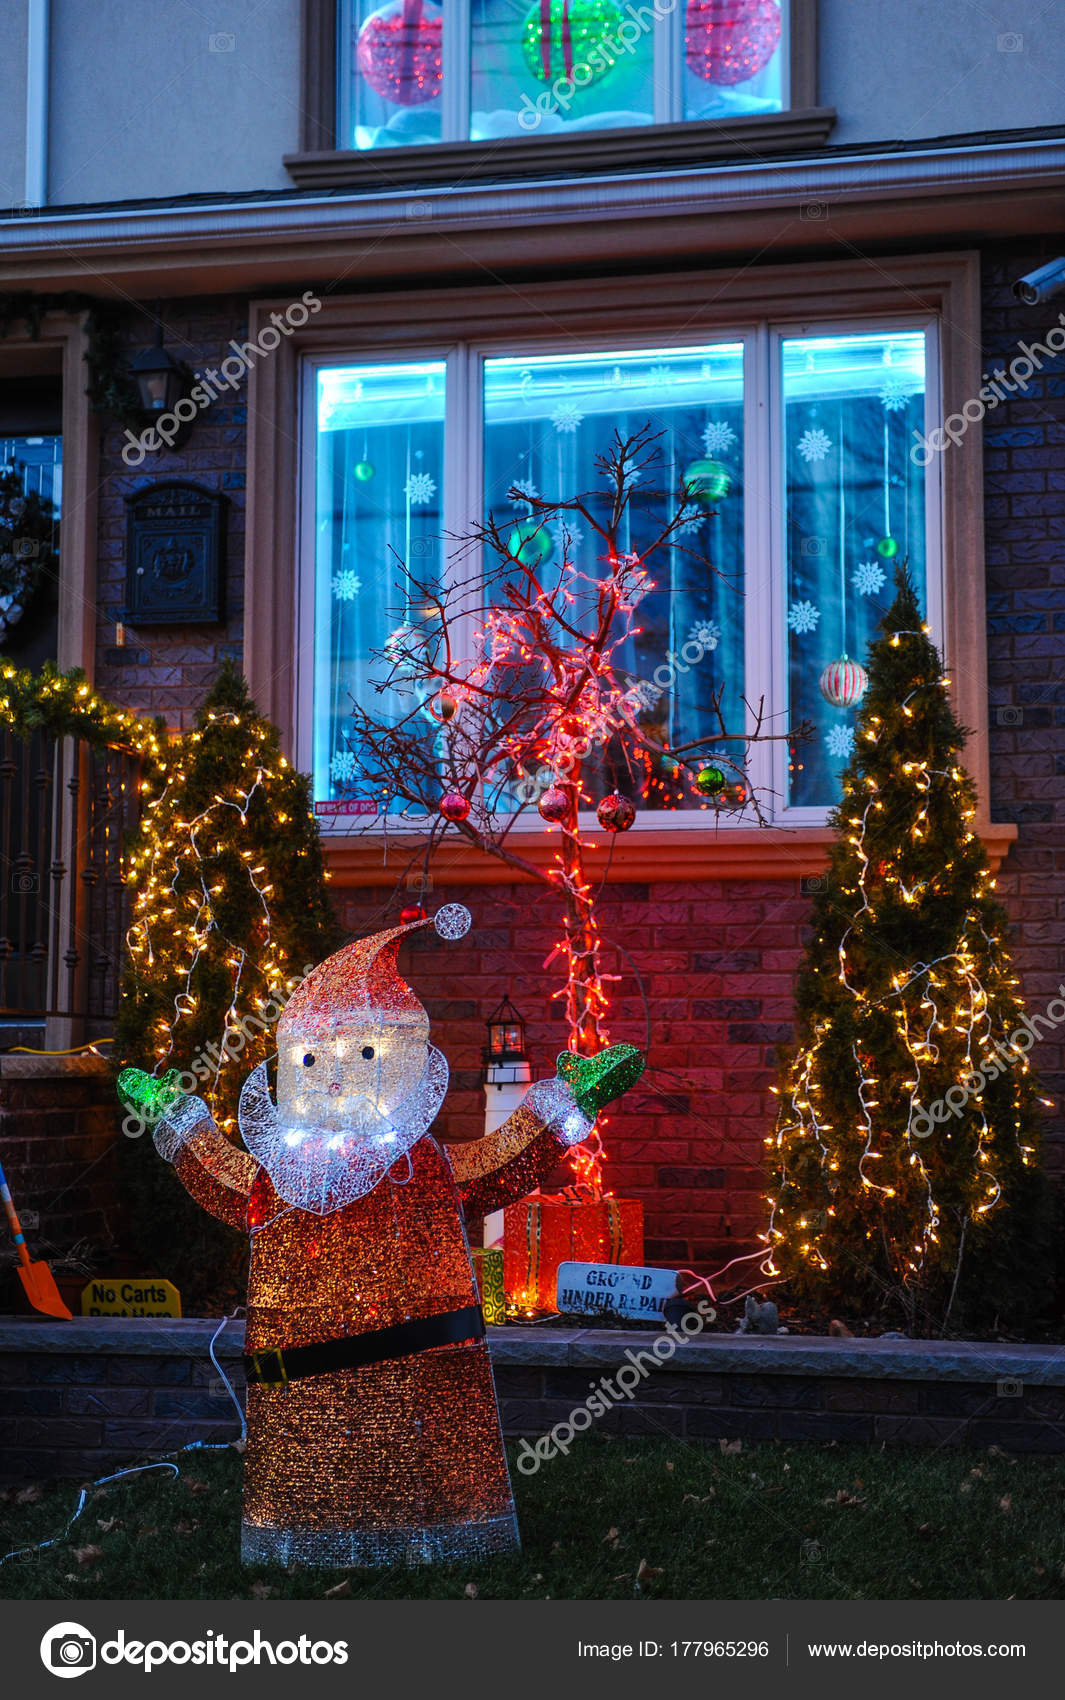 Casas decoradas en navidad 2017 oh decor curtain for Adornos navidenos 2017 trackid sp 006